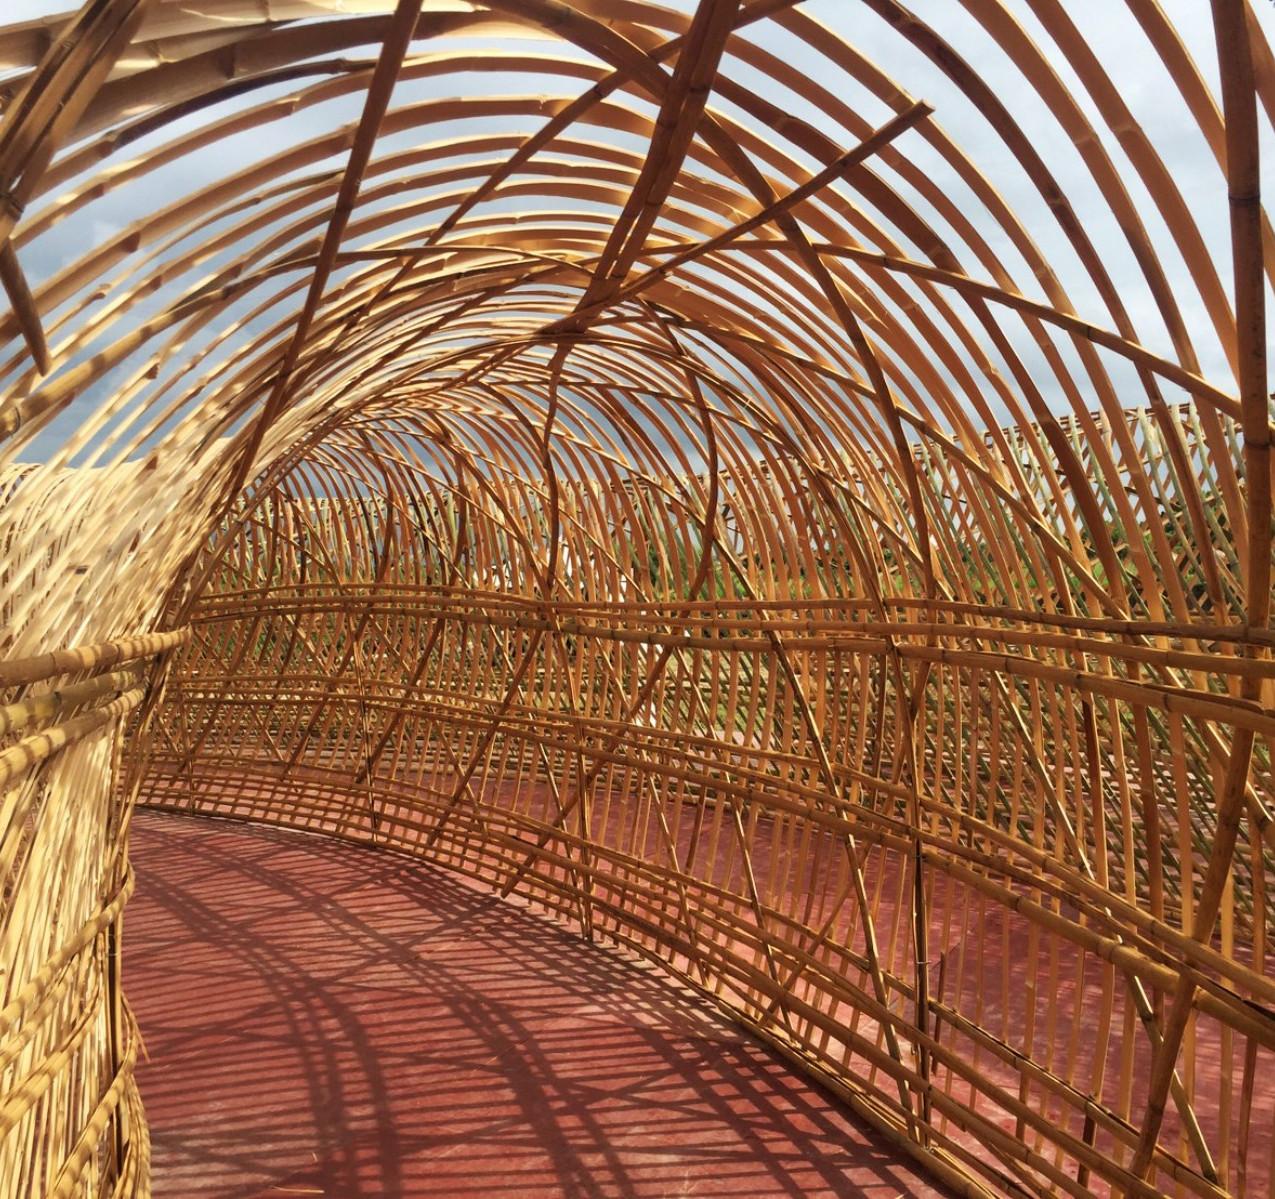 The Ripple Maze at Gaoshuang (4)